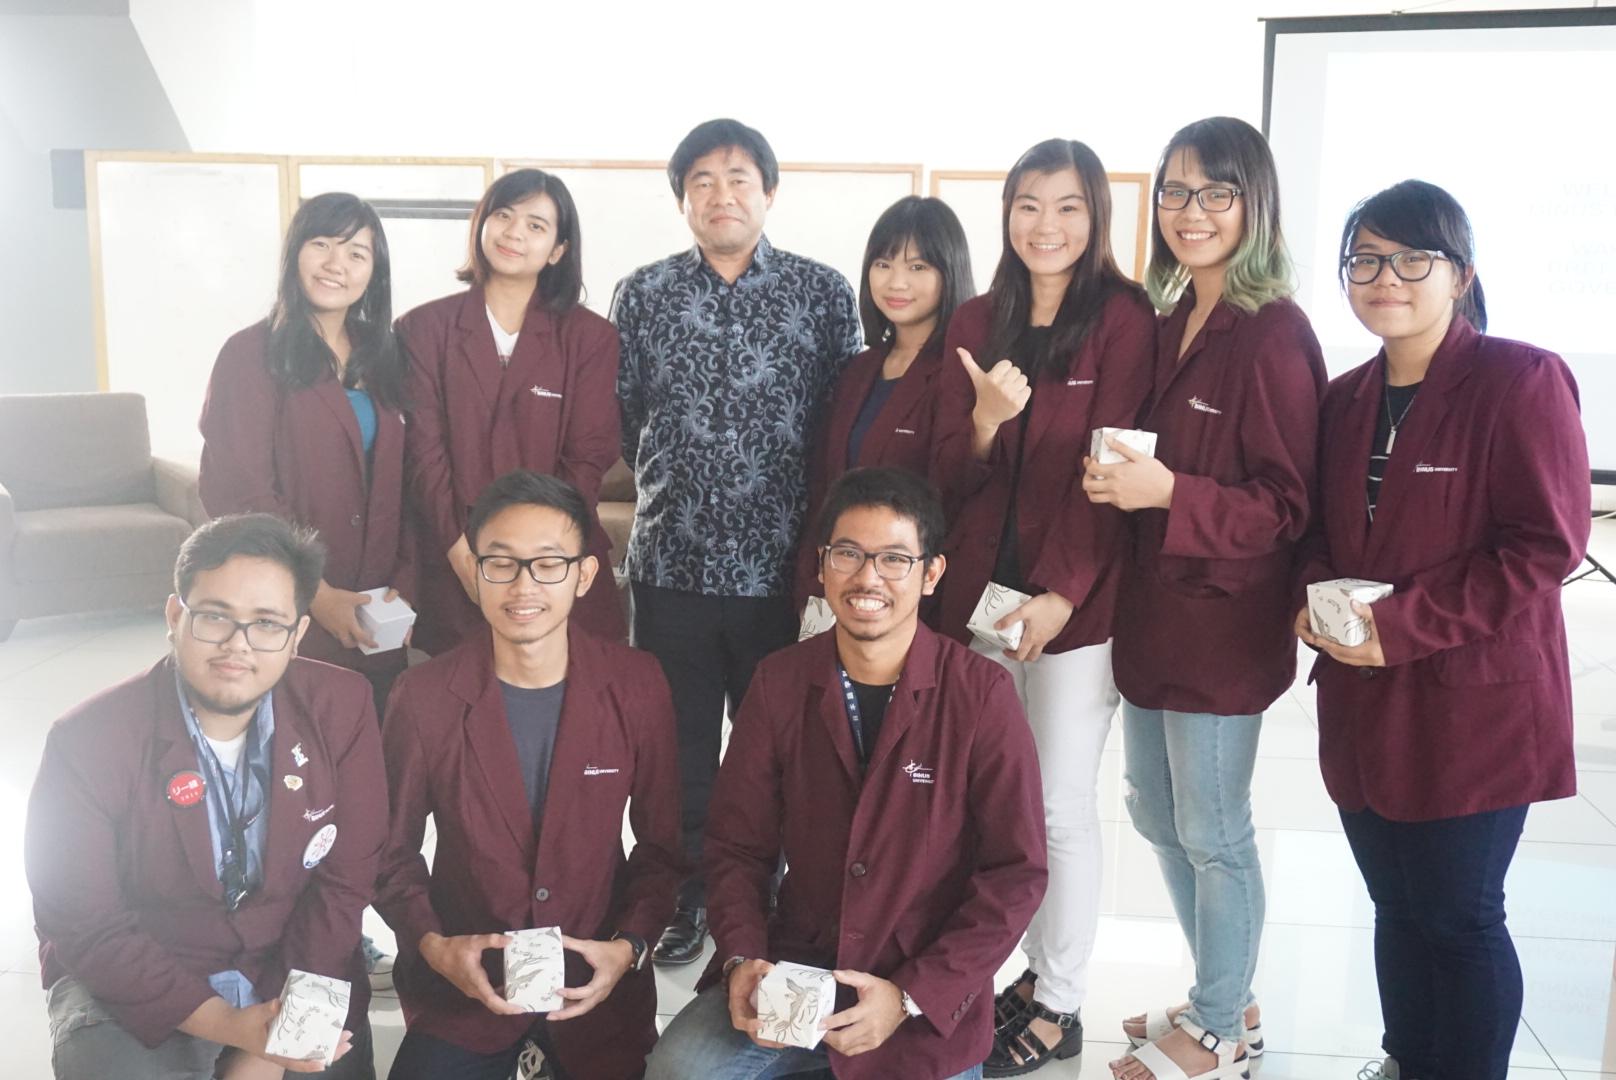 Kunjungan Pengusaha Wakayama ke Bina Nusantara University